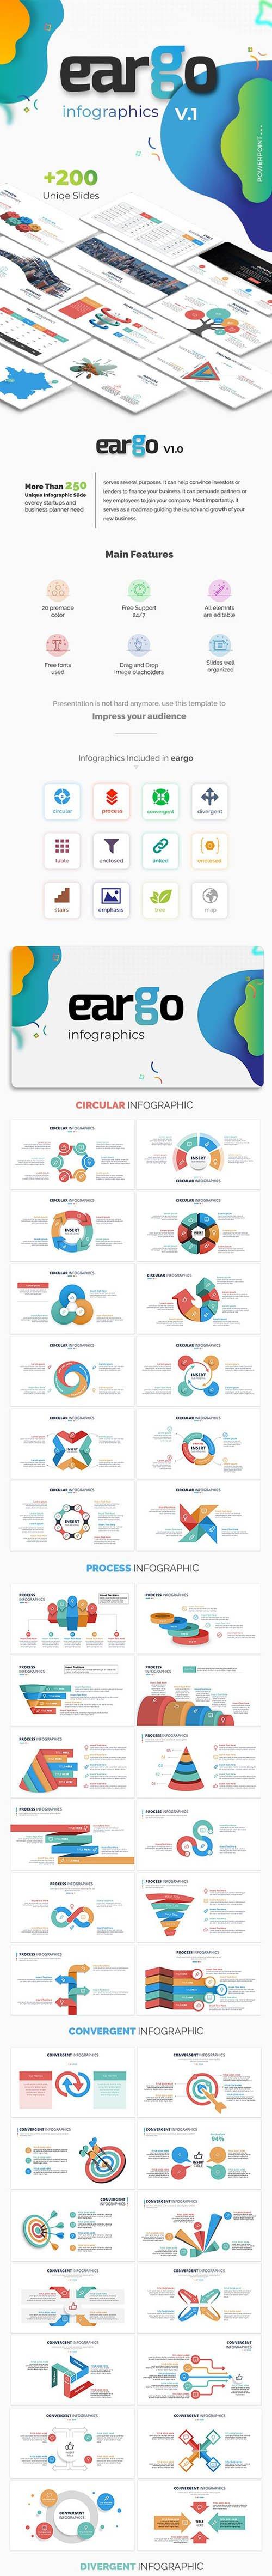 Eargo - Infographics PowerPoint Template 22323761